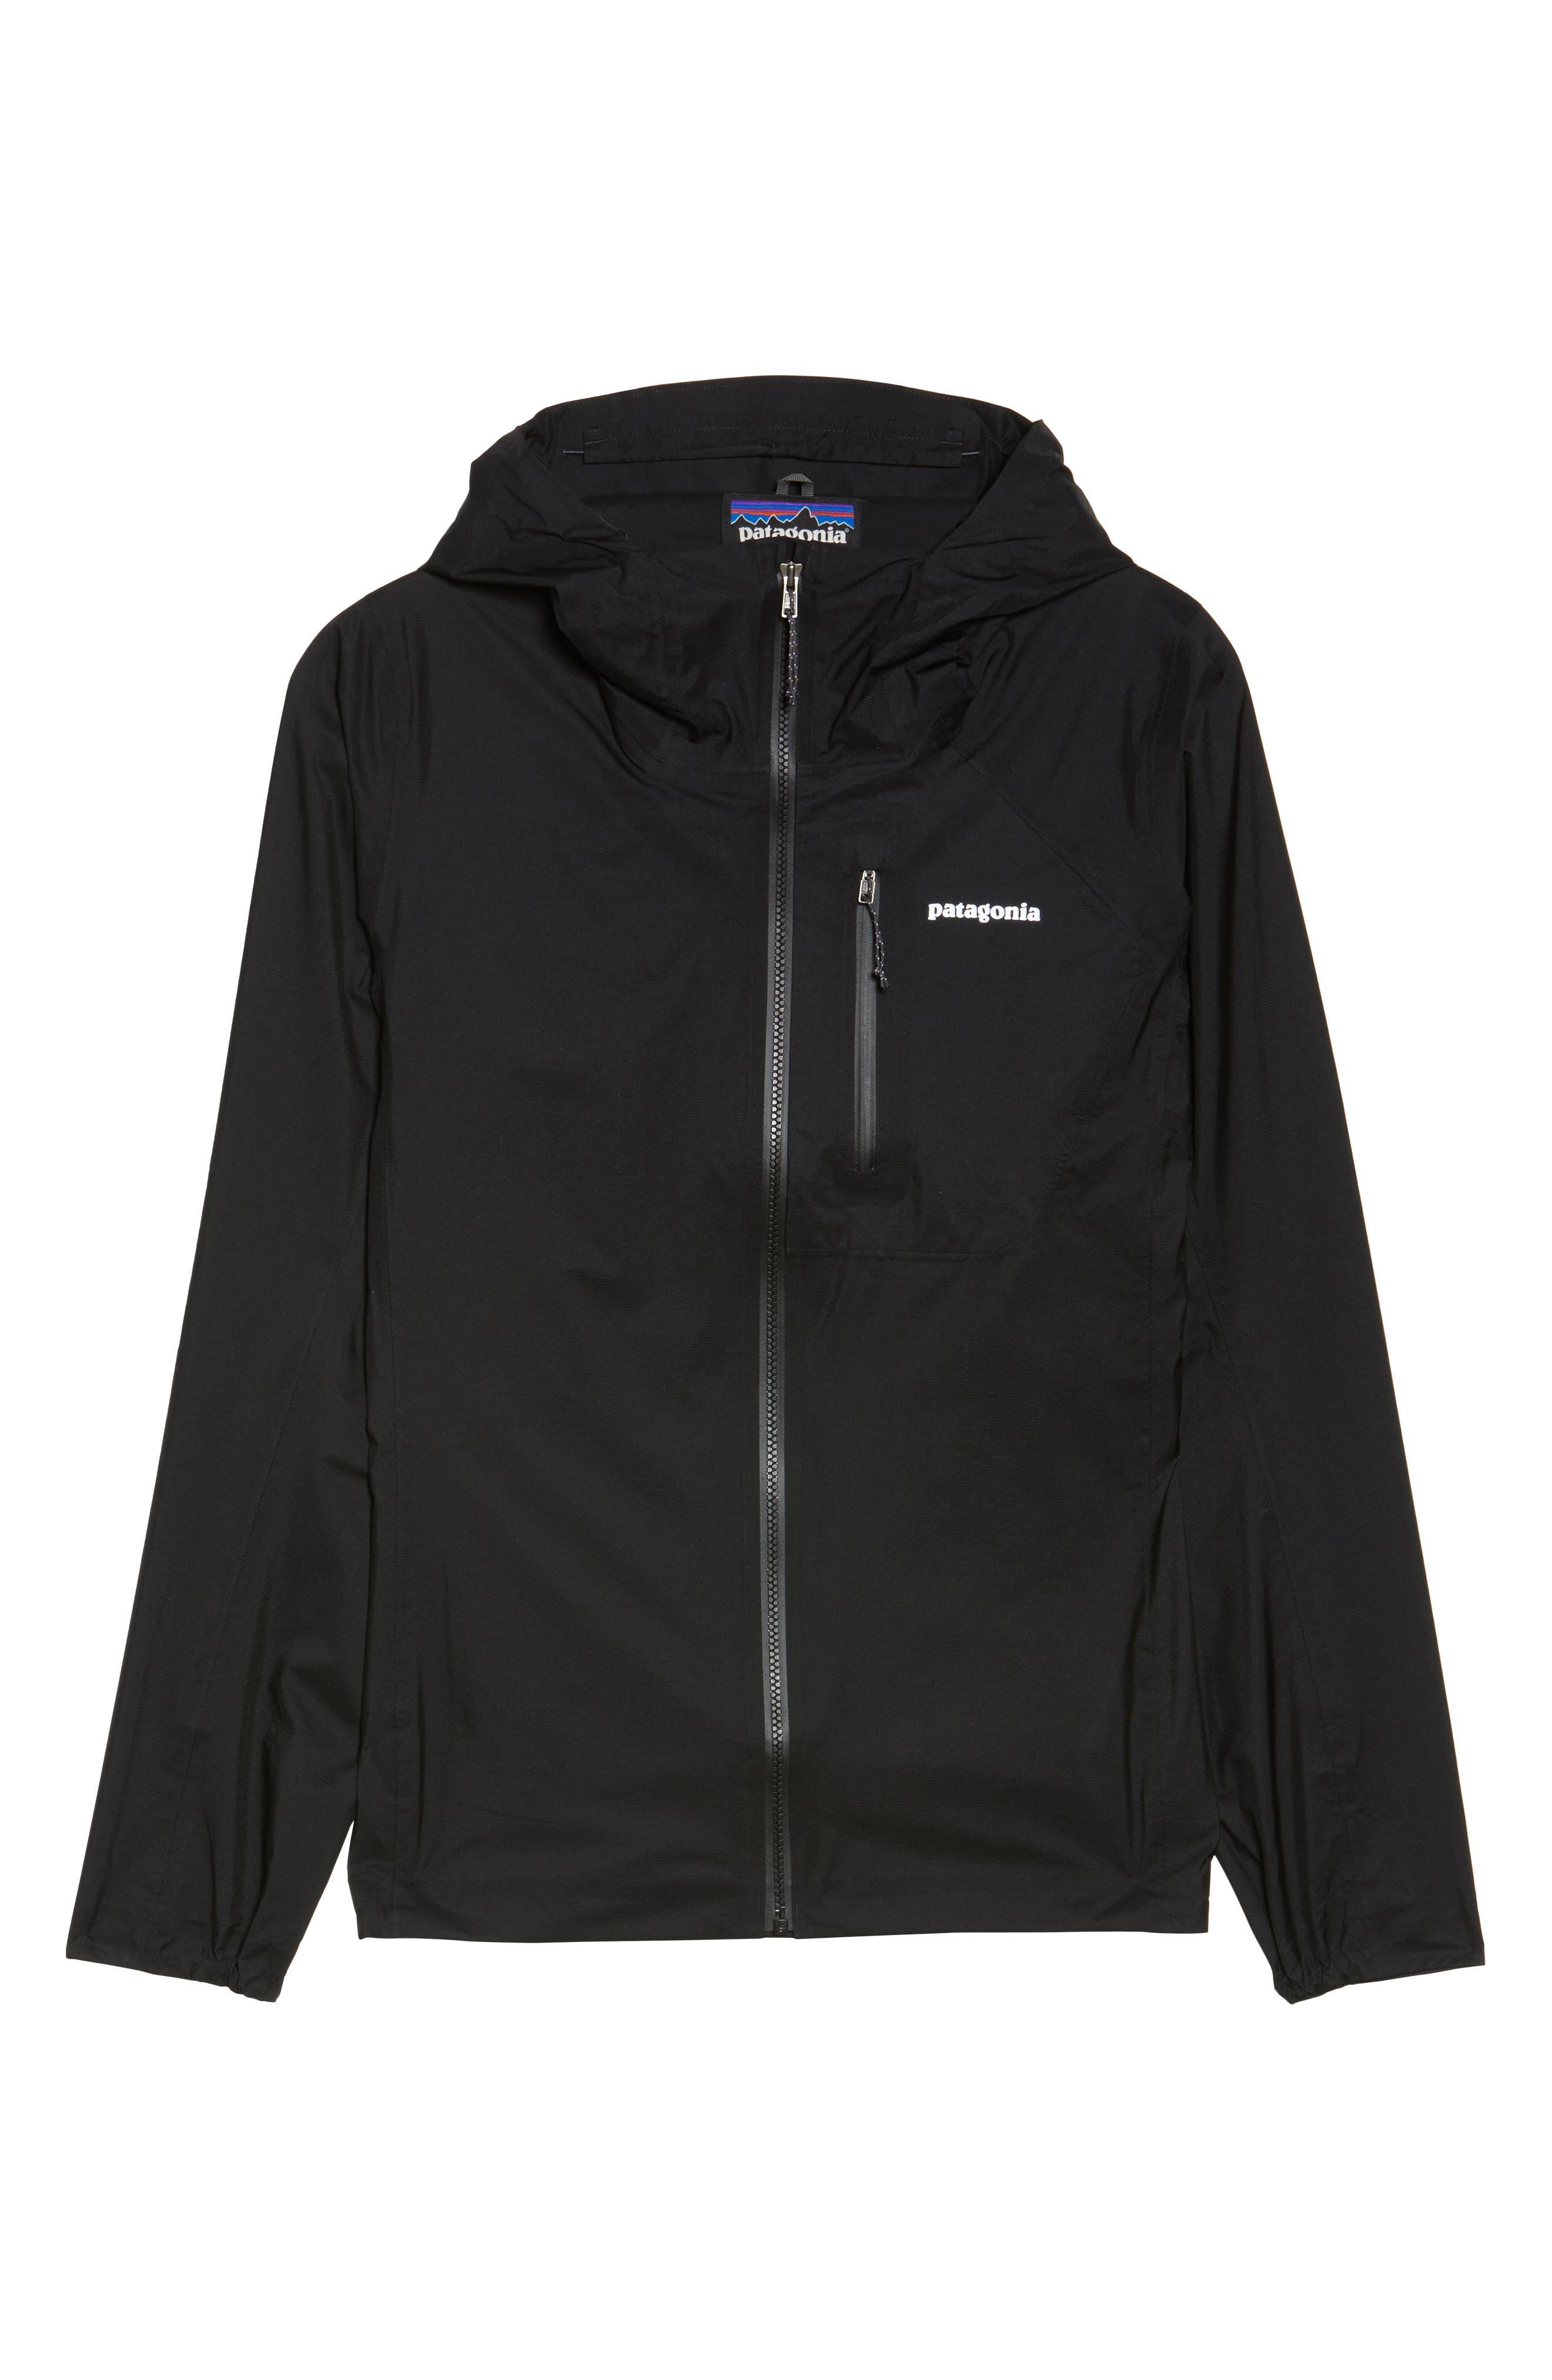 Storm Racer Jacket,                             Alternate thumbnail 6, color,                             BLACK